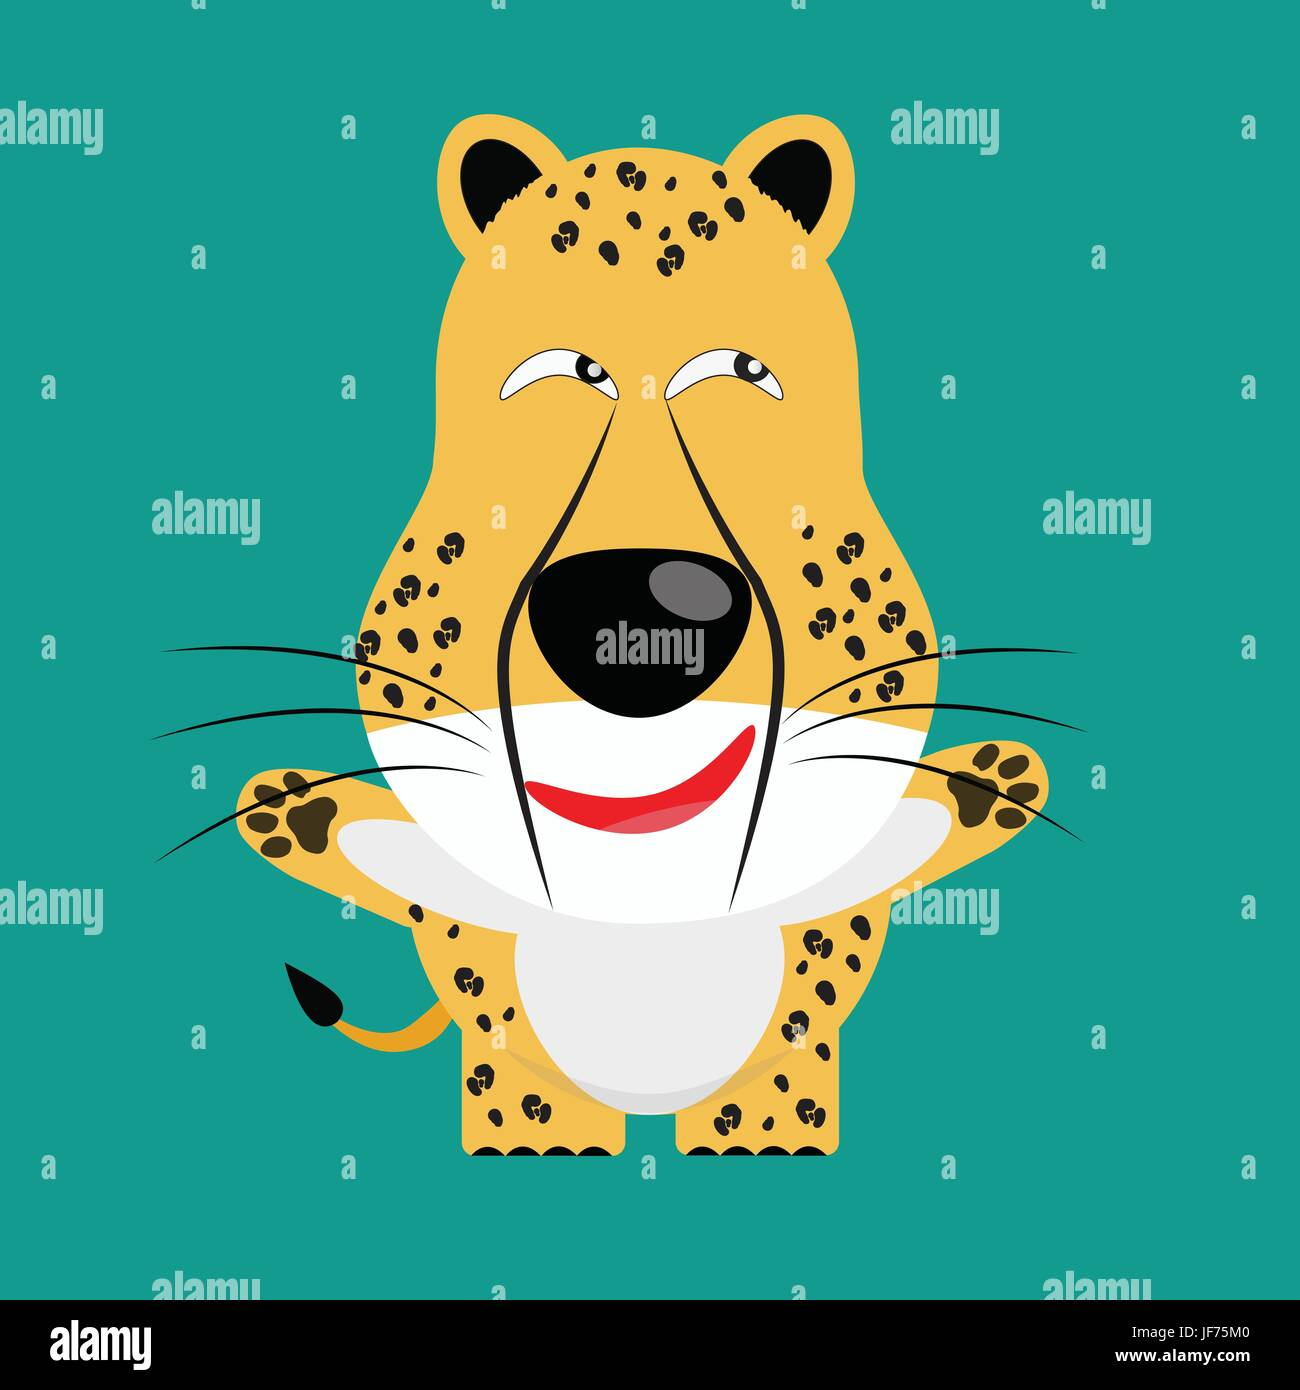 tricky cheetah gartoon character Stock Vector